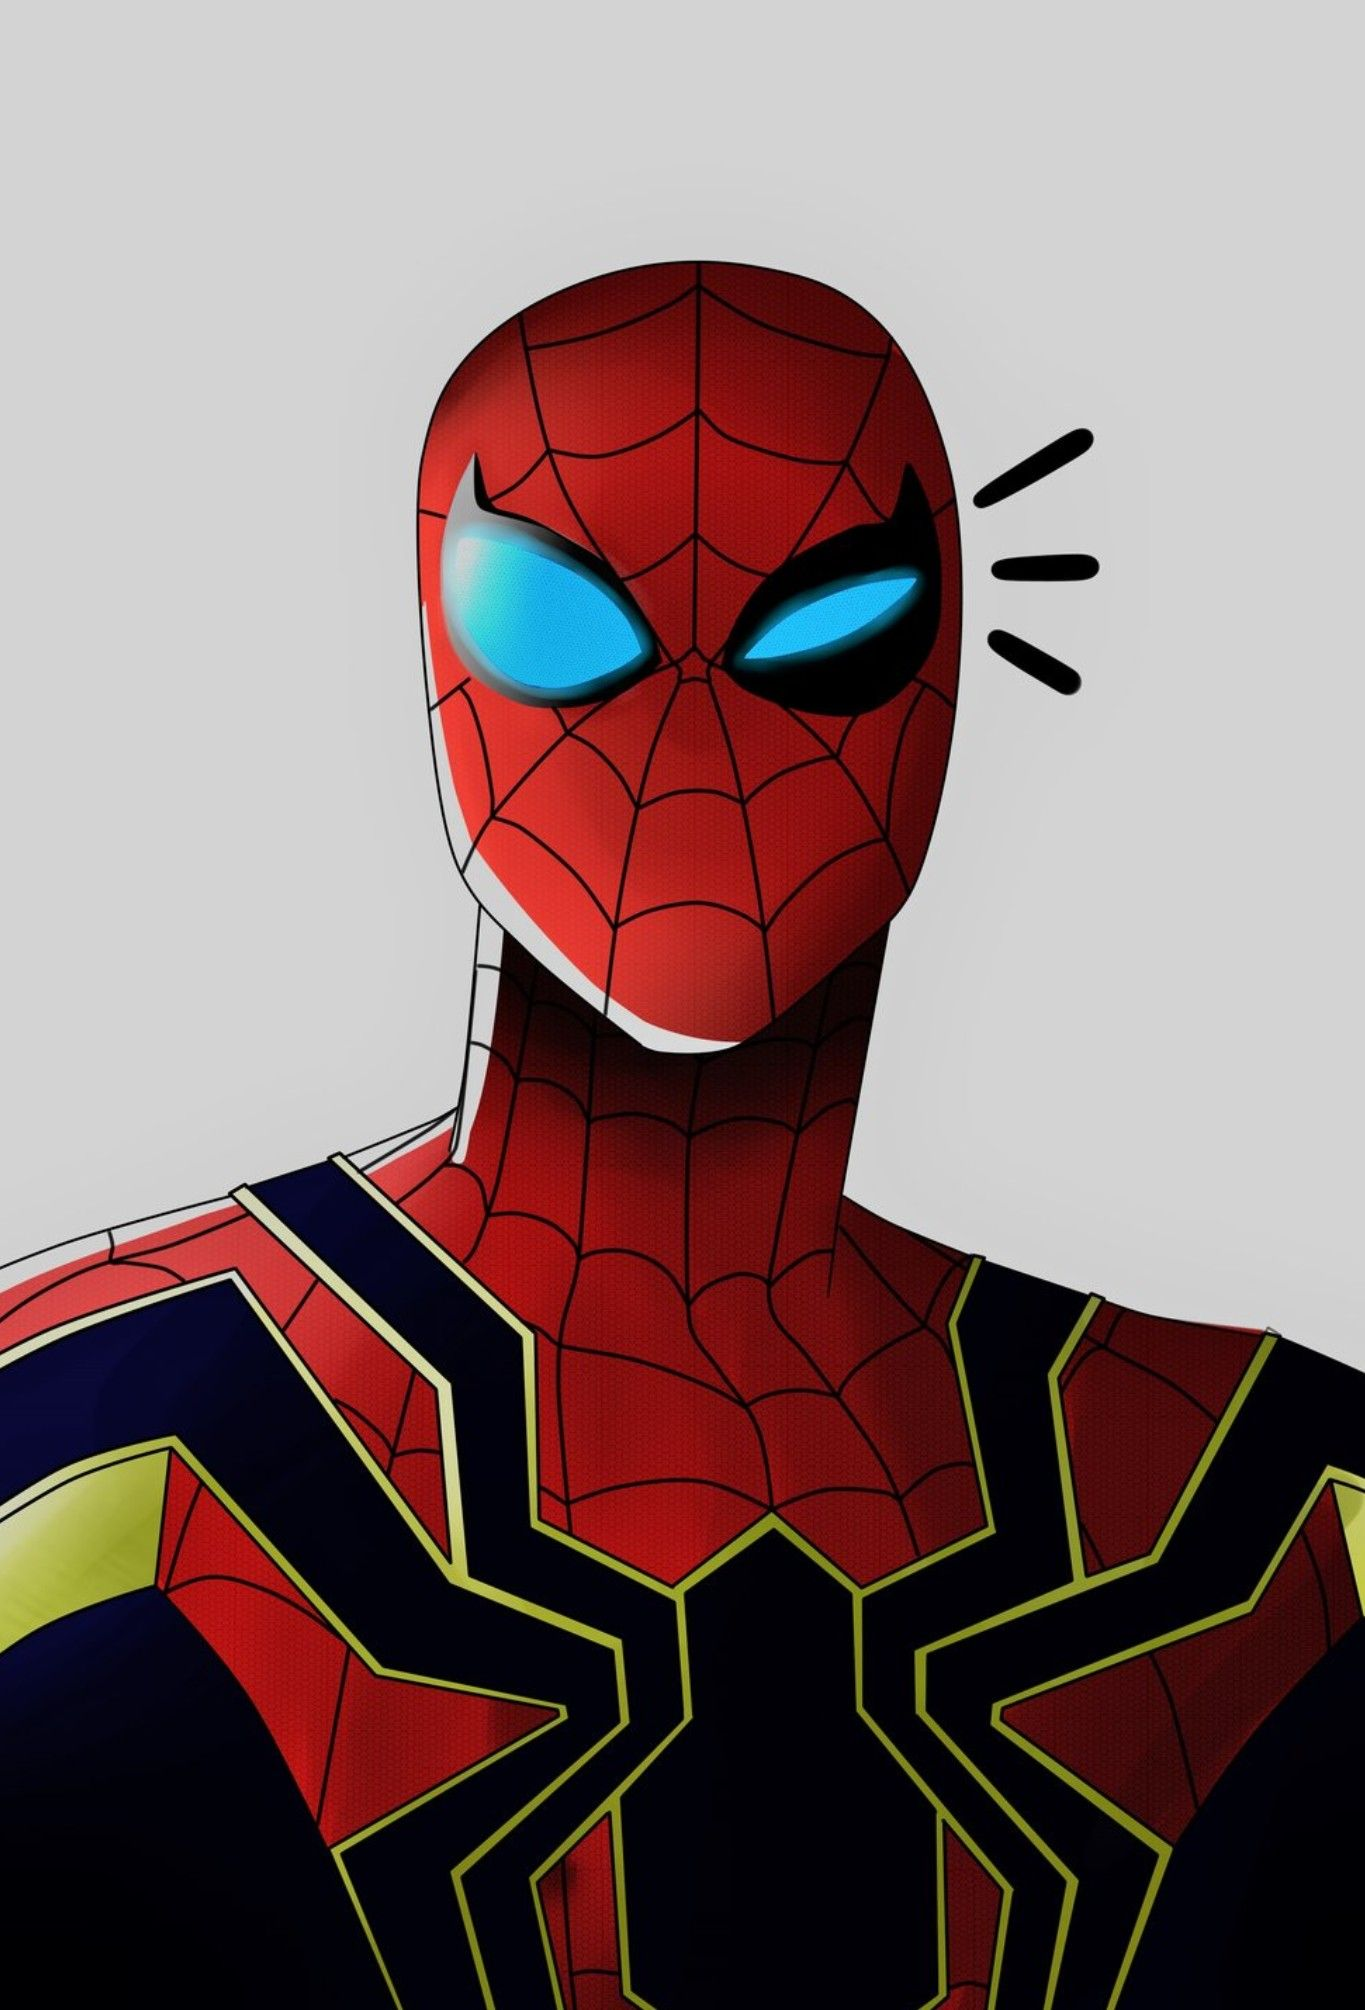 Iron Spider Man Amazing Spiderman Spiderman Art Spiderman Comic